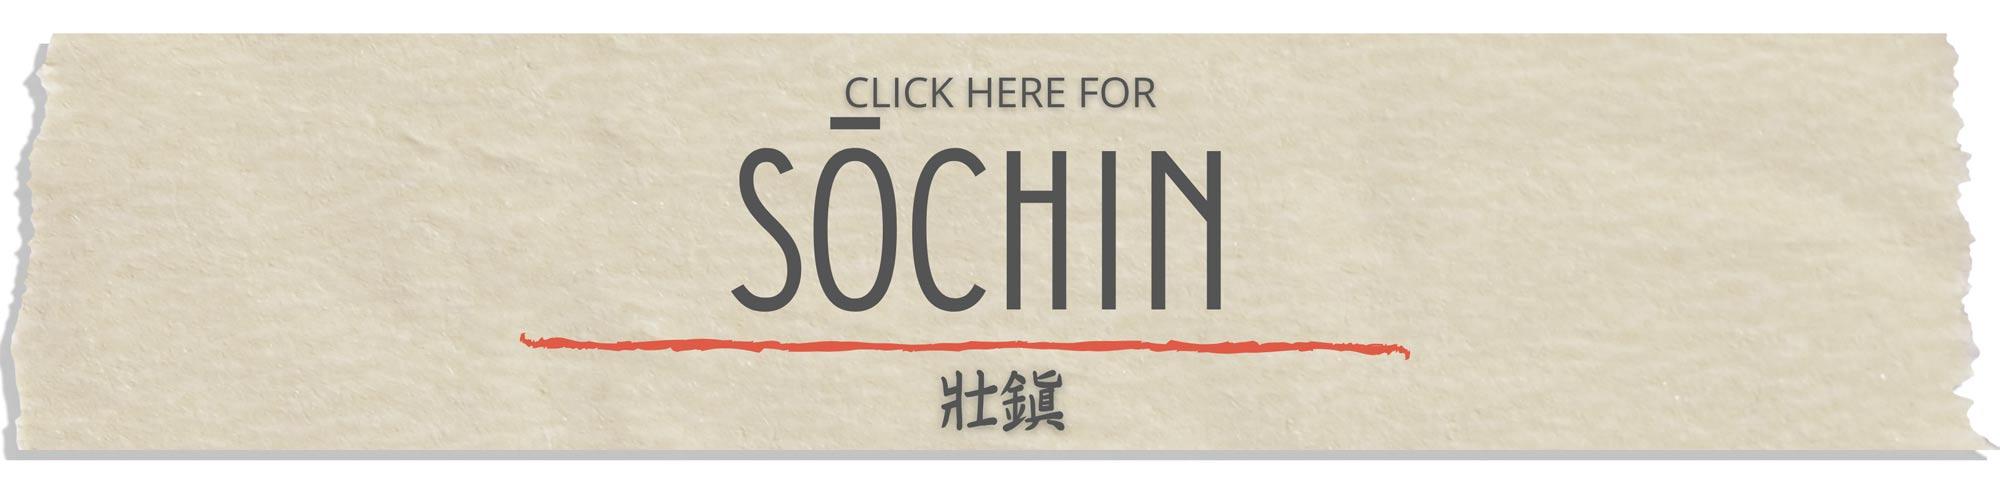 sochin tutorial